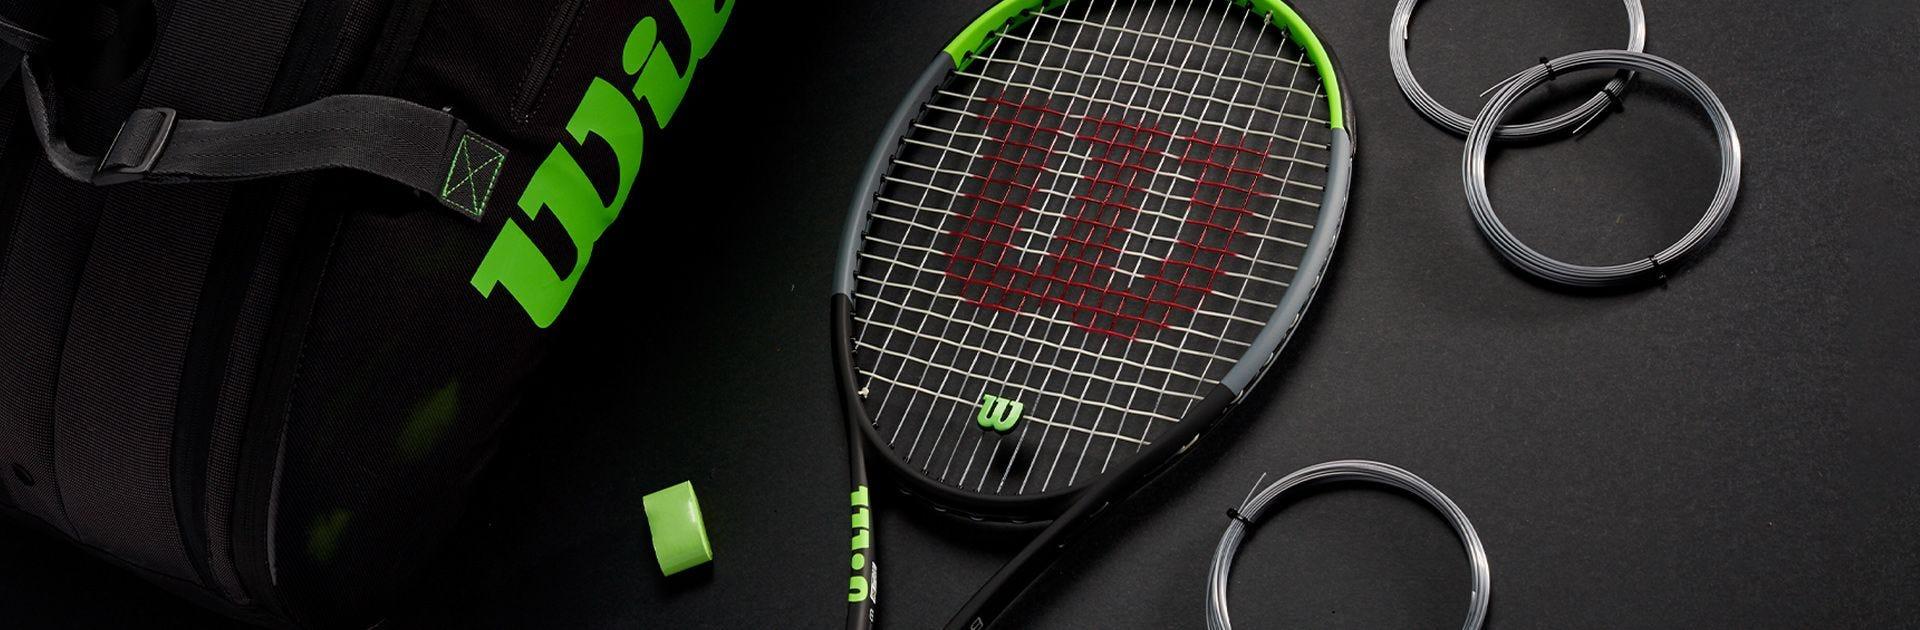 Blade Tennis Racket Giveaway | Wilson Sporting Goods